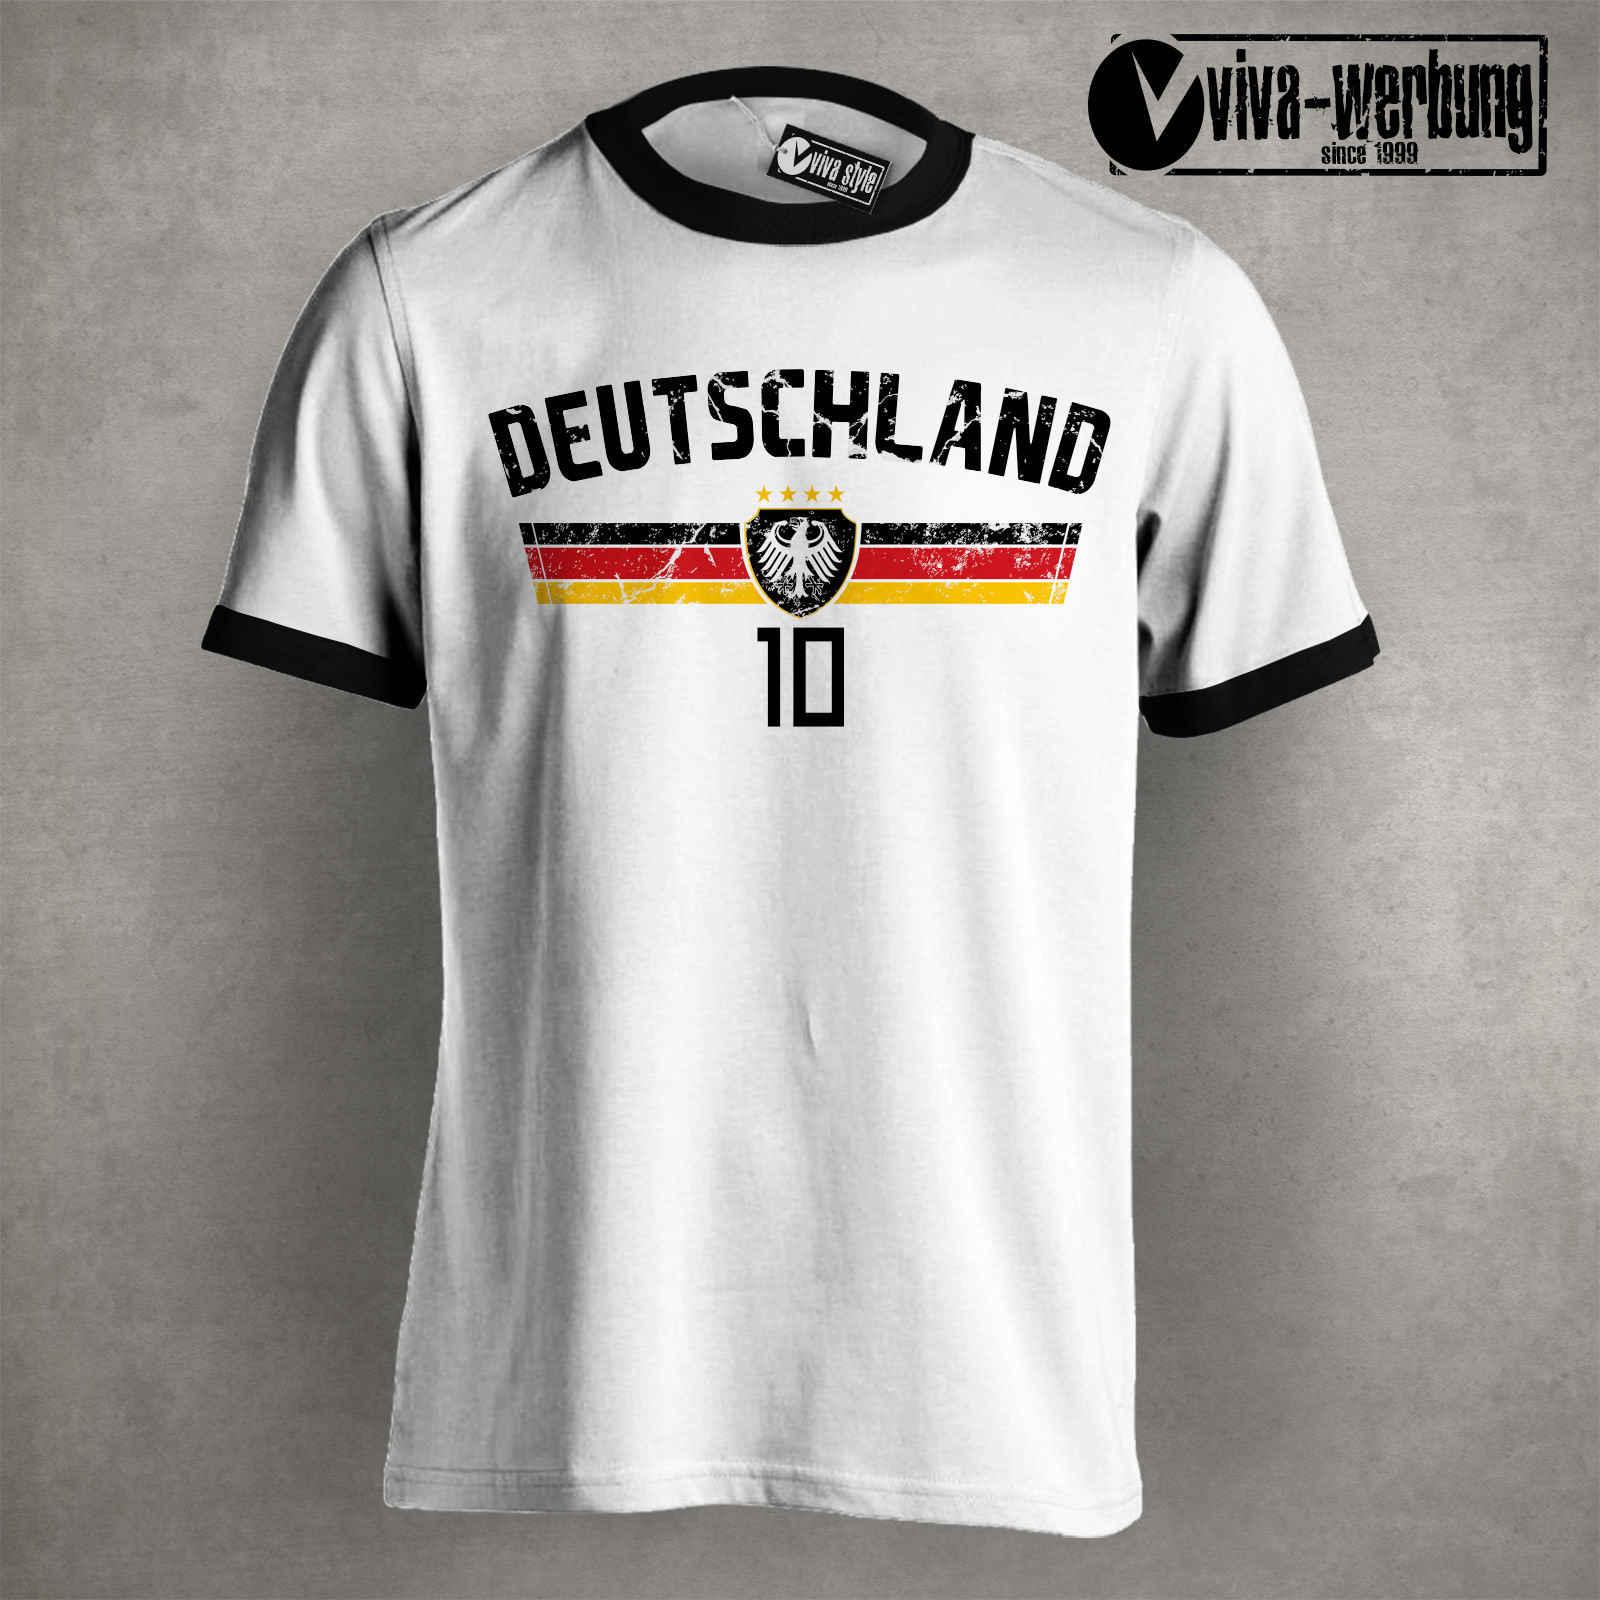 Новинка 2020, модная летняя хлопковая футболка с короткими рукавами, Футболка Deutschland, футболка 2020, футболист, Германия, Трикот, Fanst, футболки для мужчин